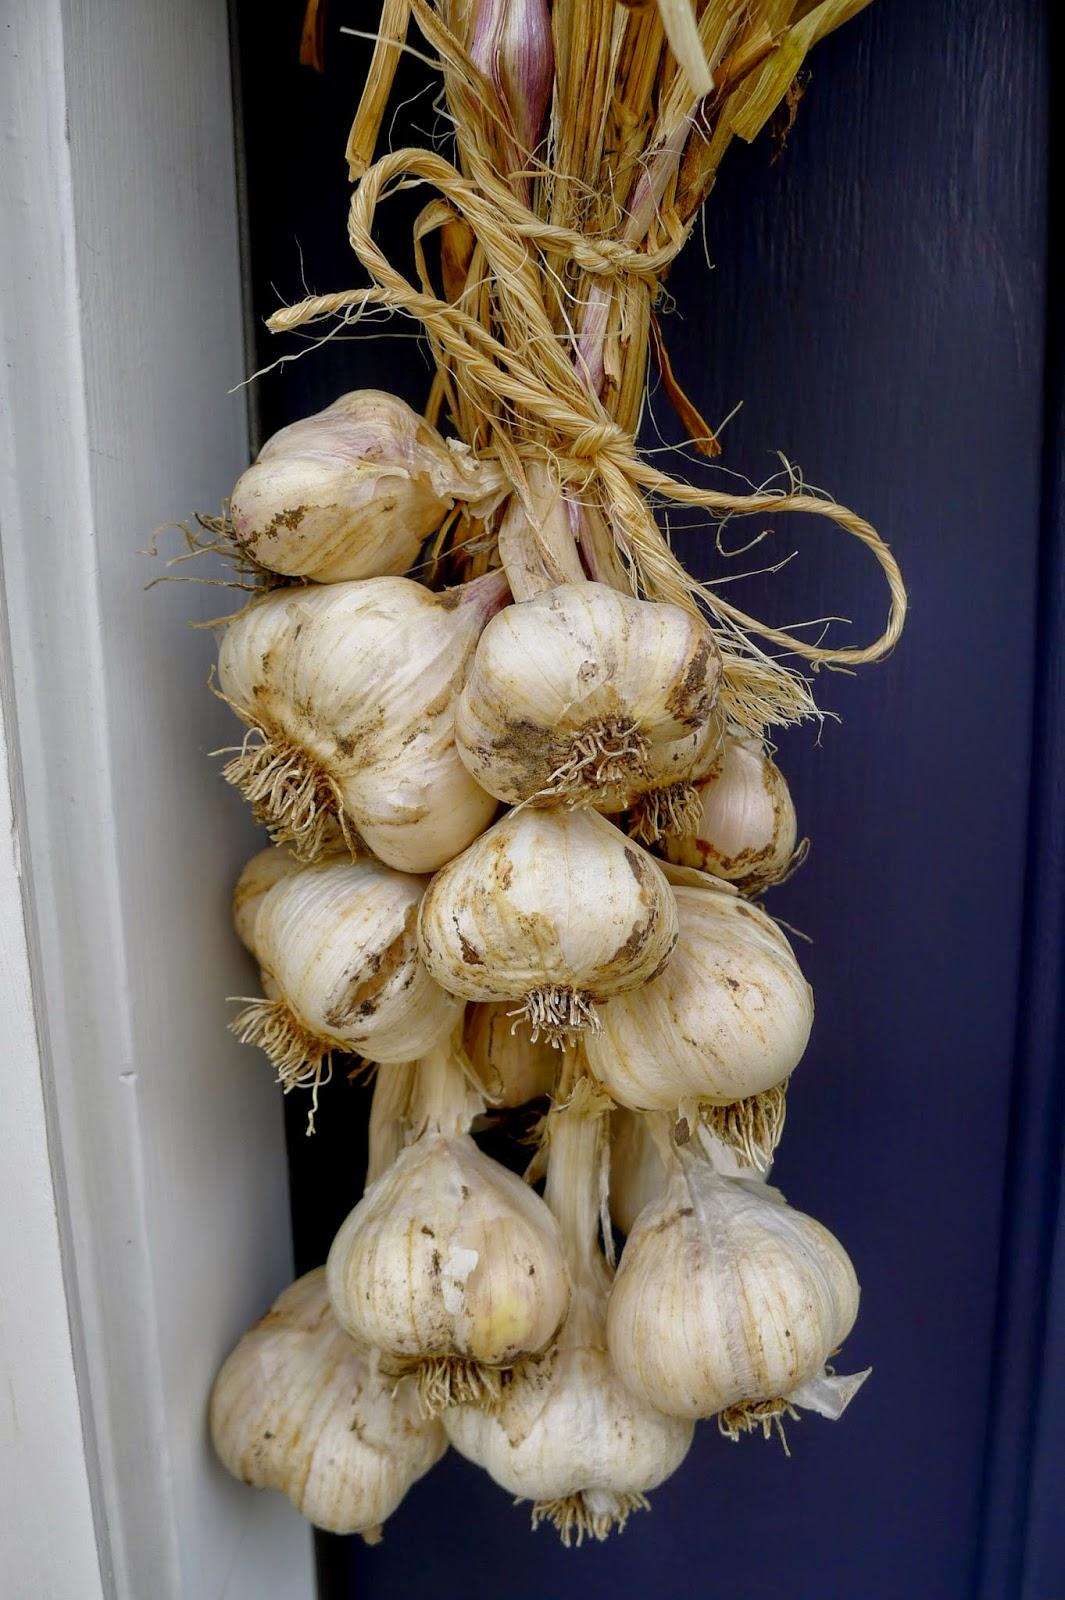 Cured garlic, preserving, urban farming, gardening